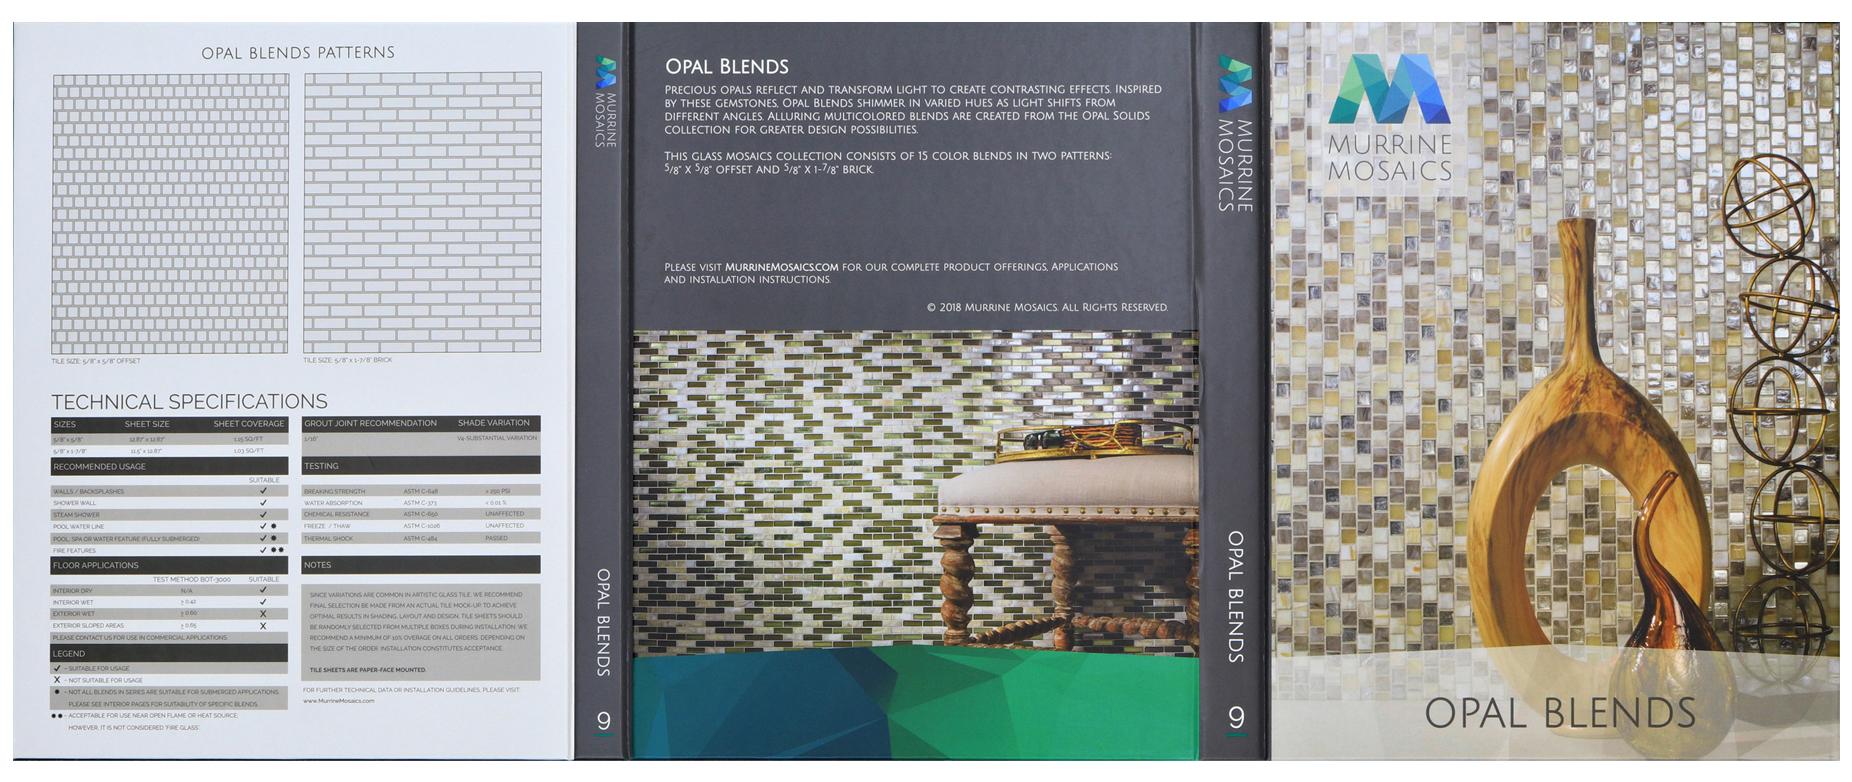 OPAL BLENDS - Outside